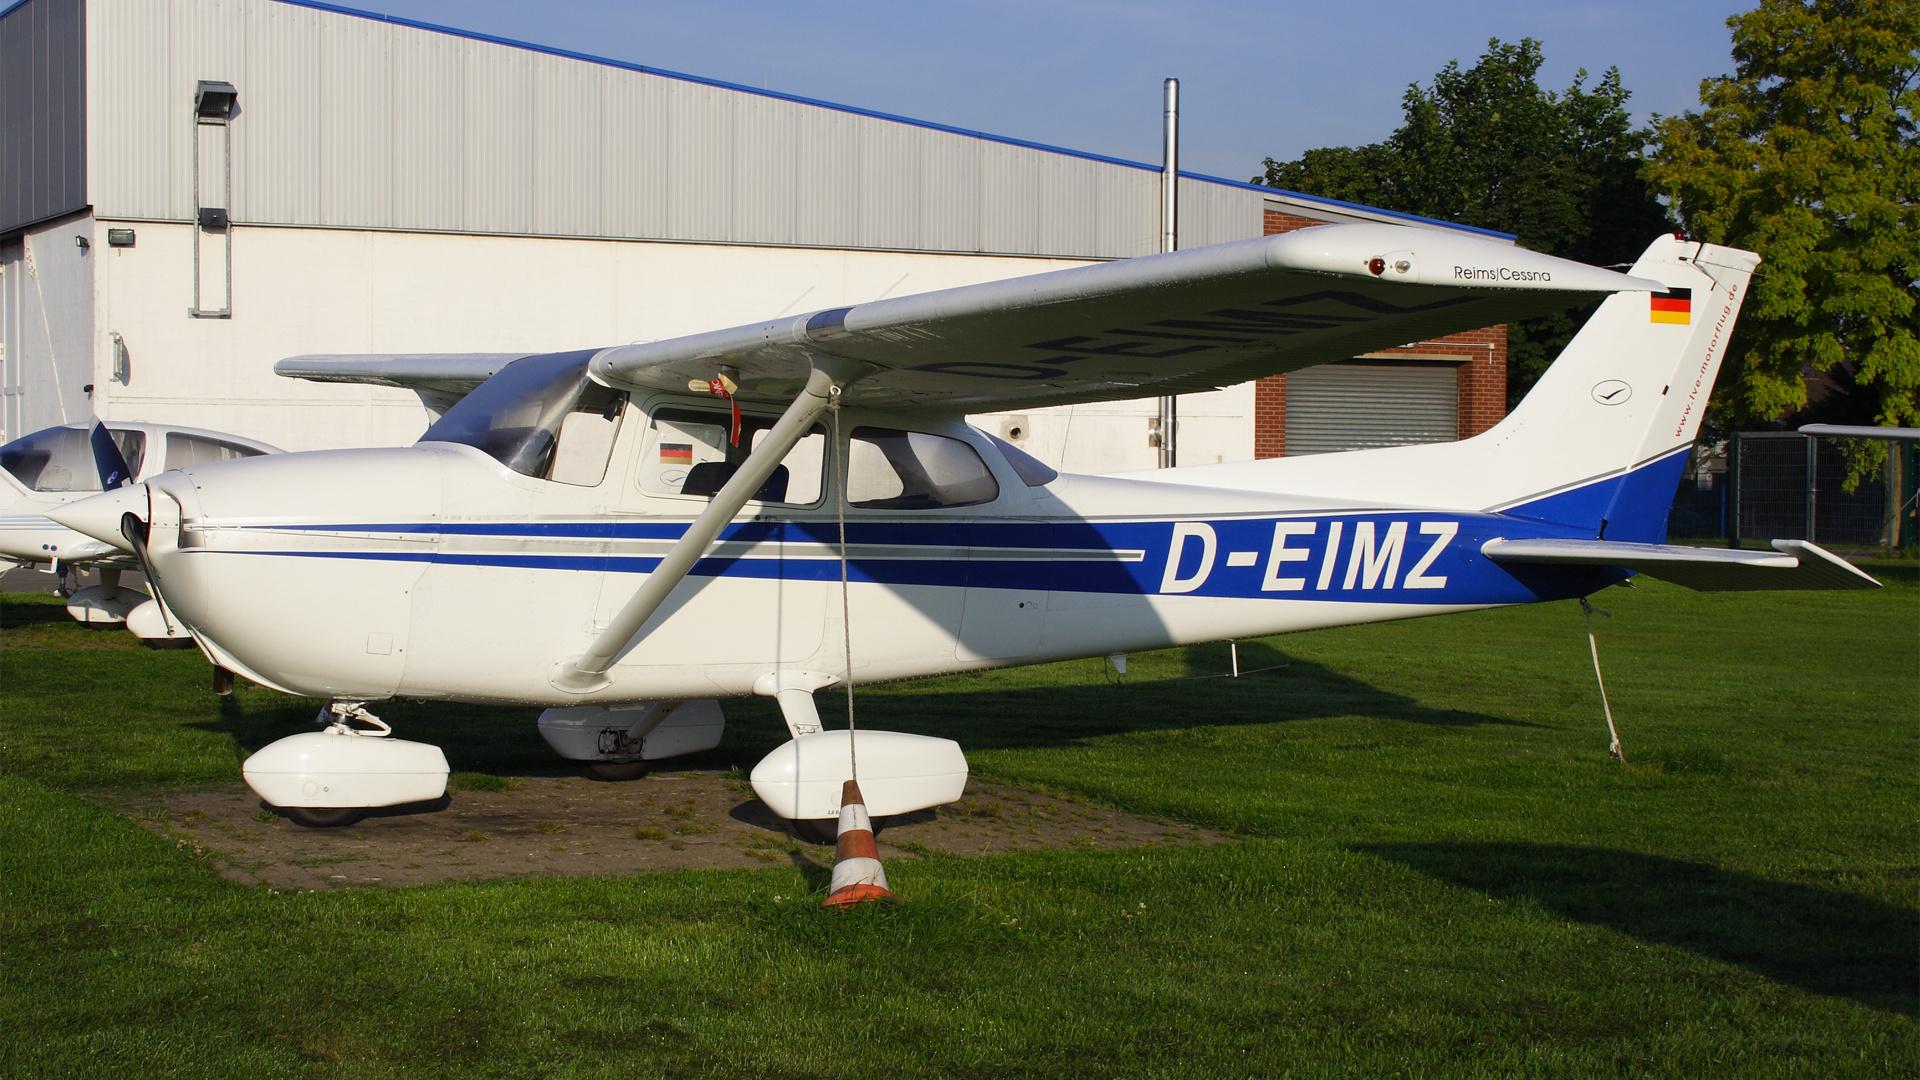 D-EIMZ-1 C172  ESS 200808